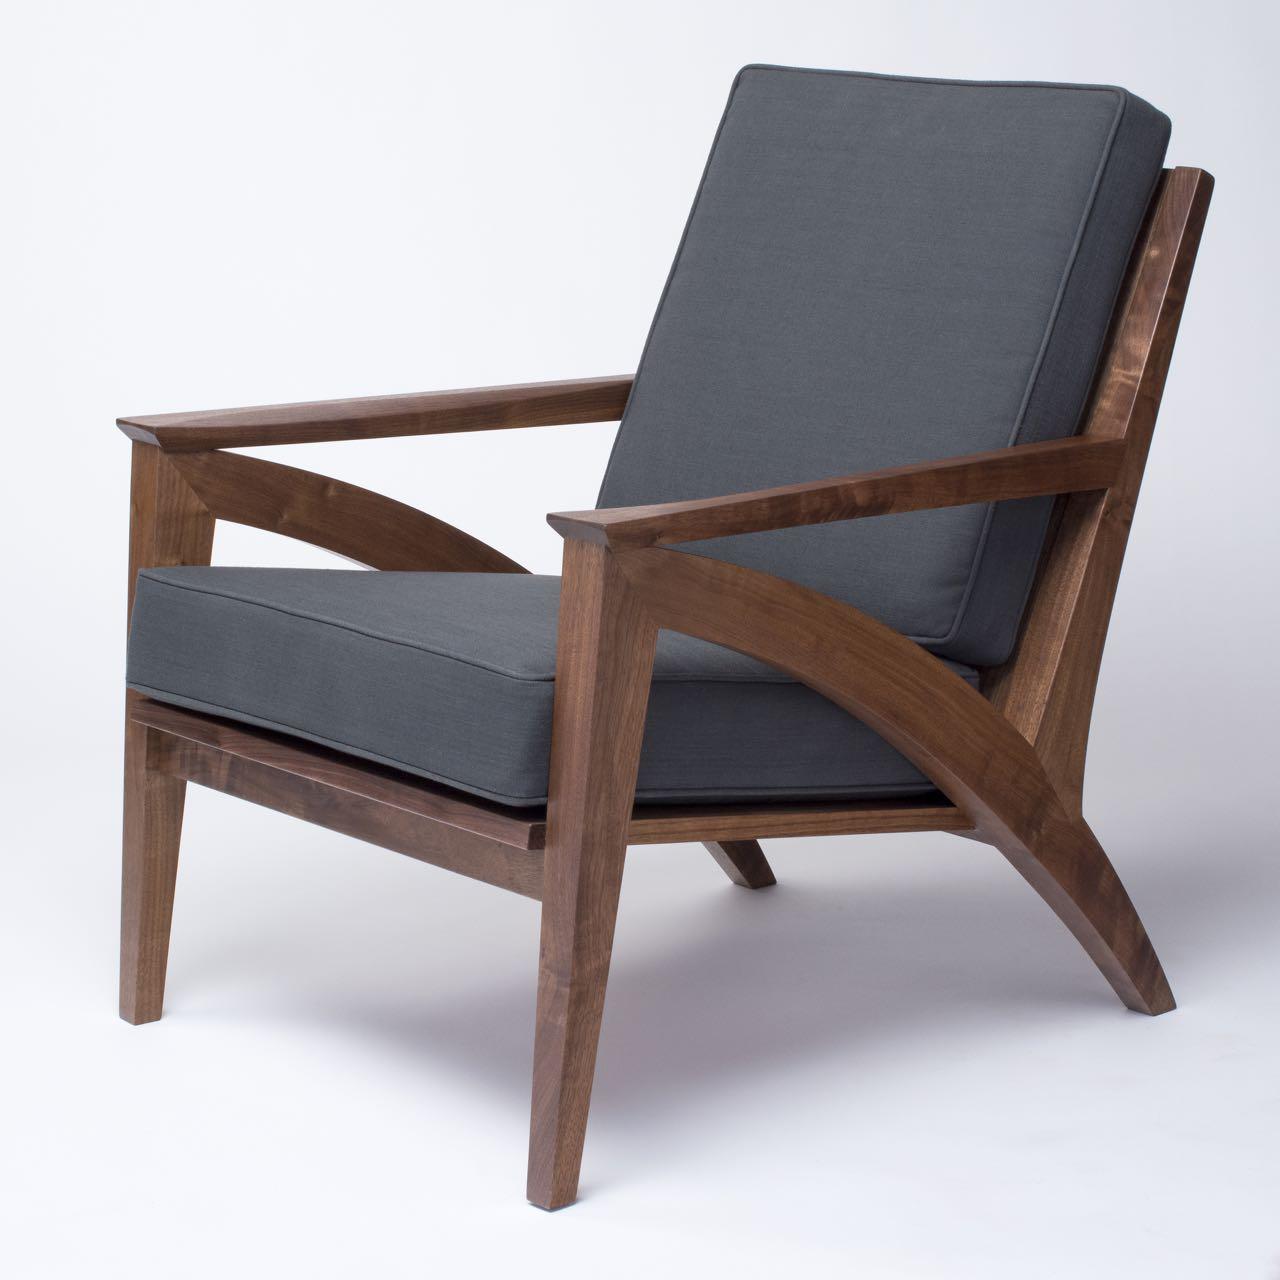 Gallery Eben Blaney Fine Contemporary Furniture